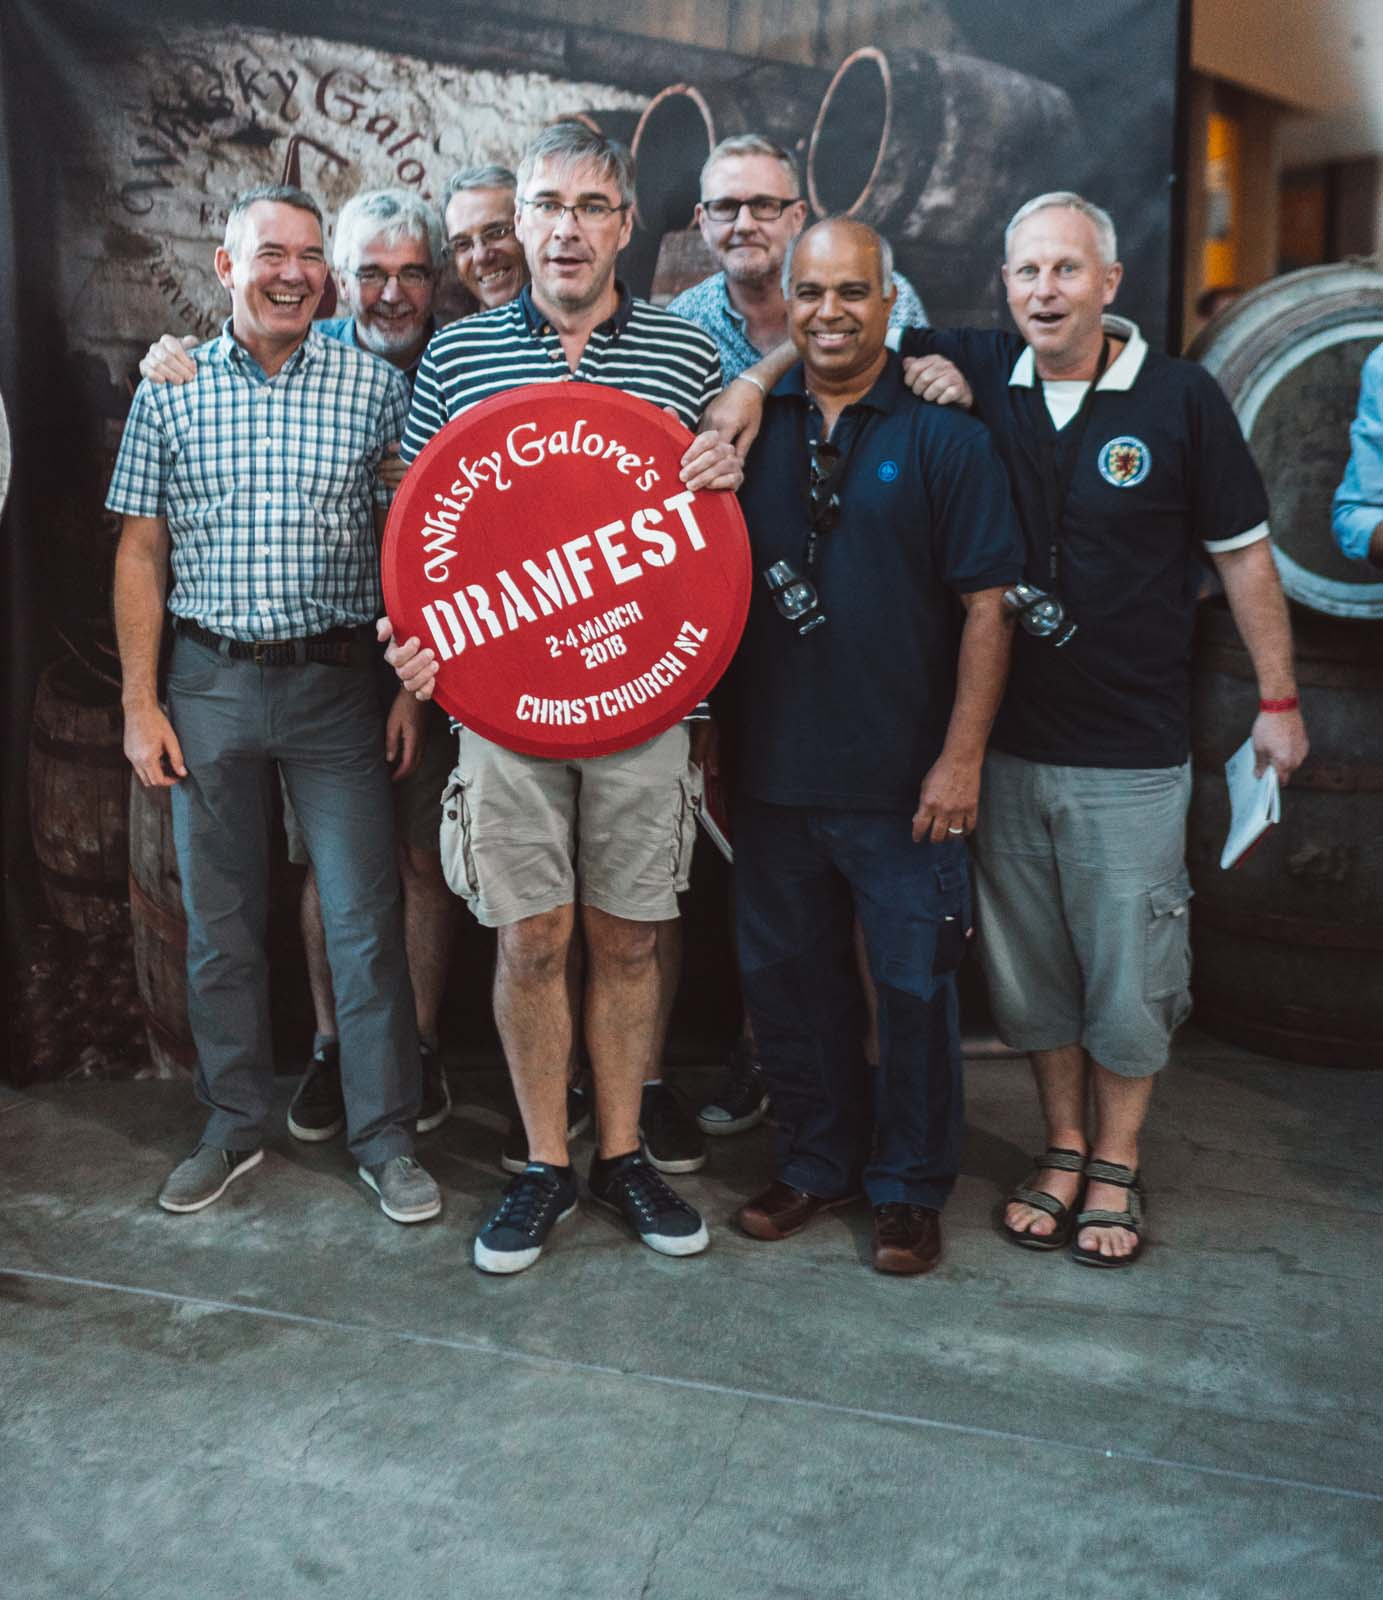 Dramfest 2018 for Whisky Galore-162.jpg